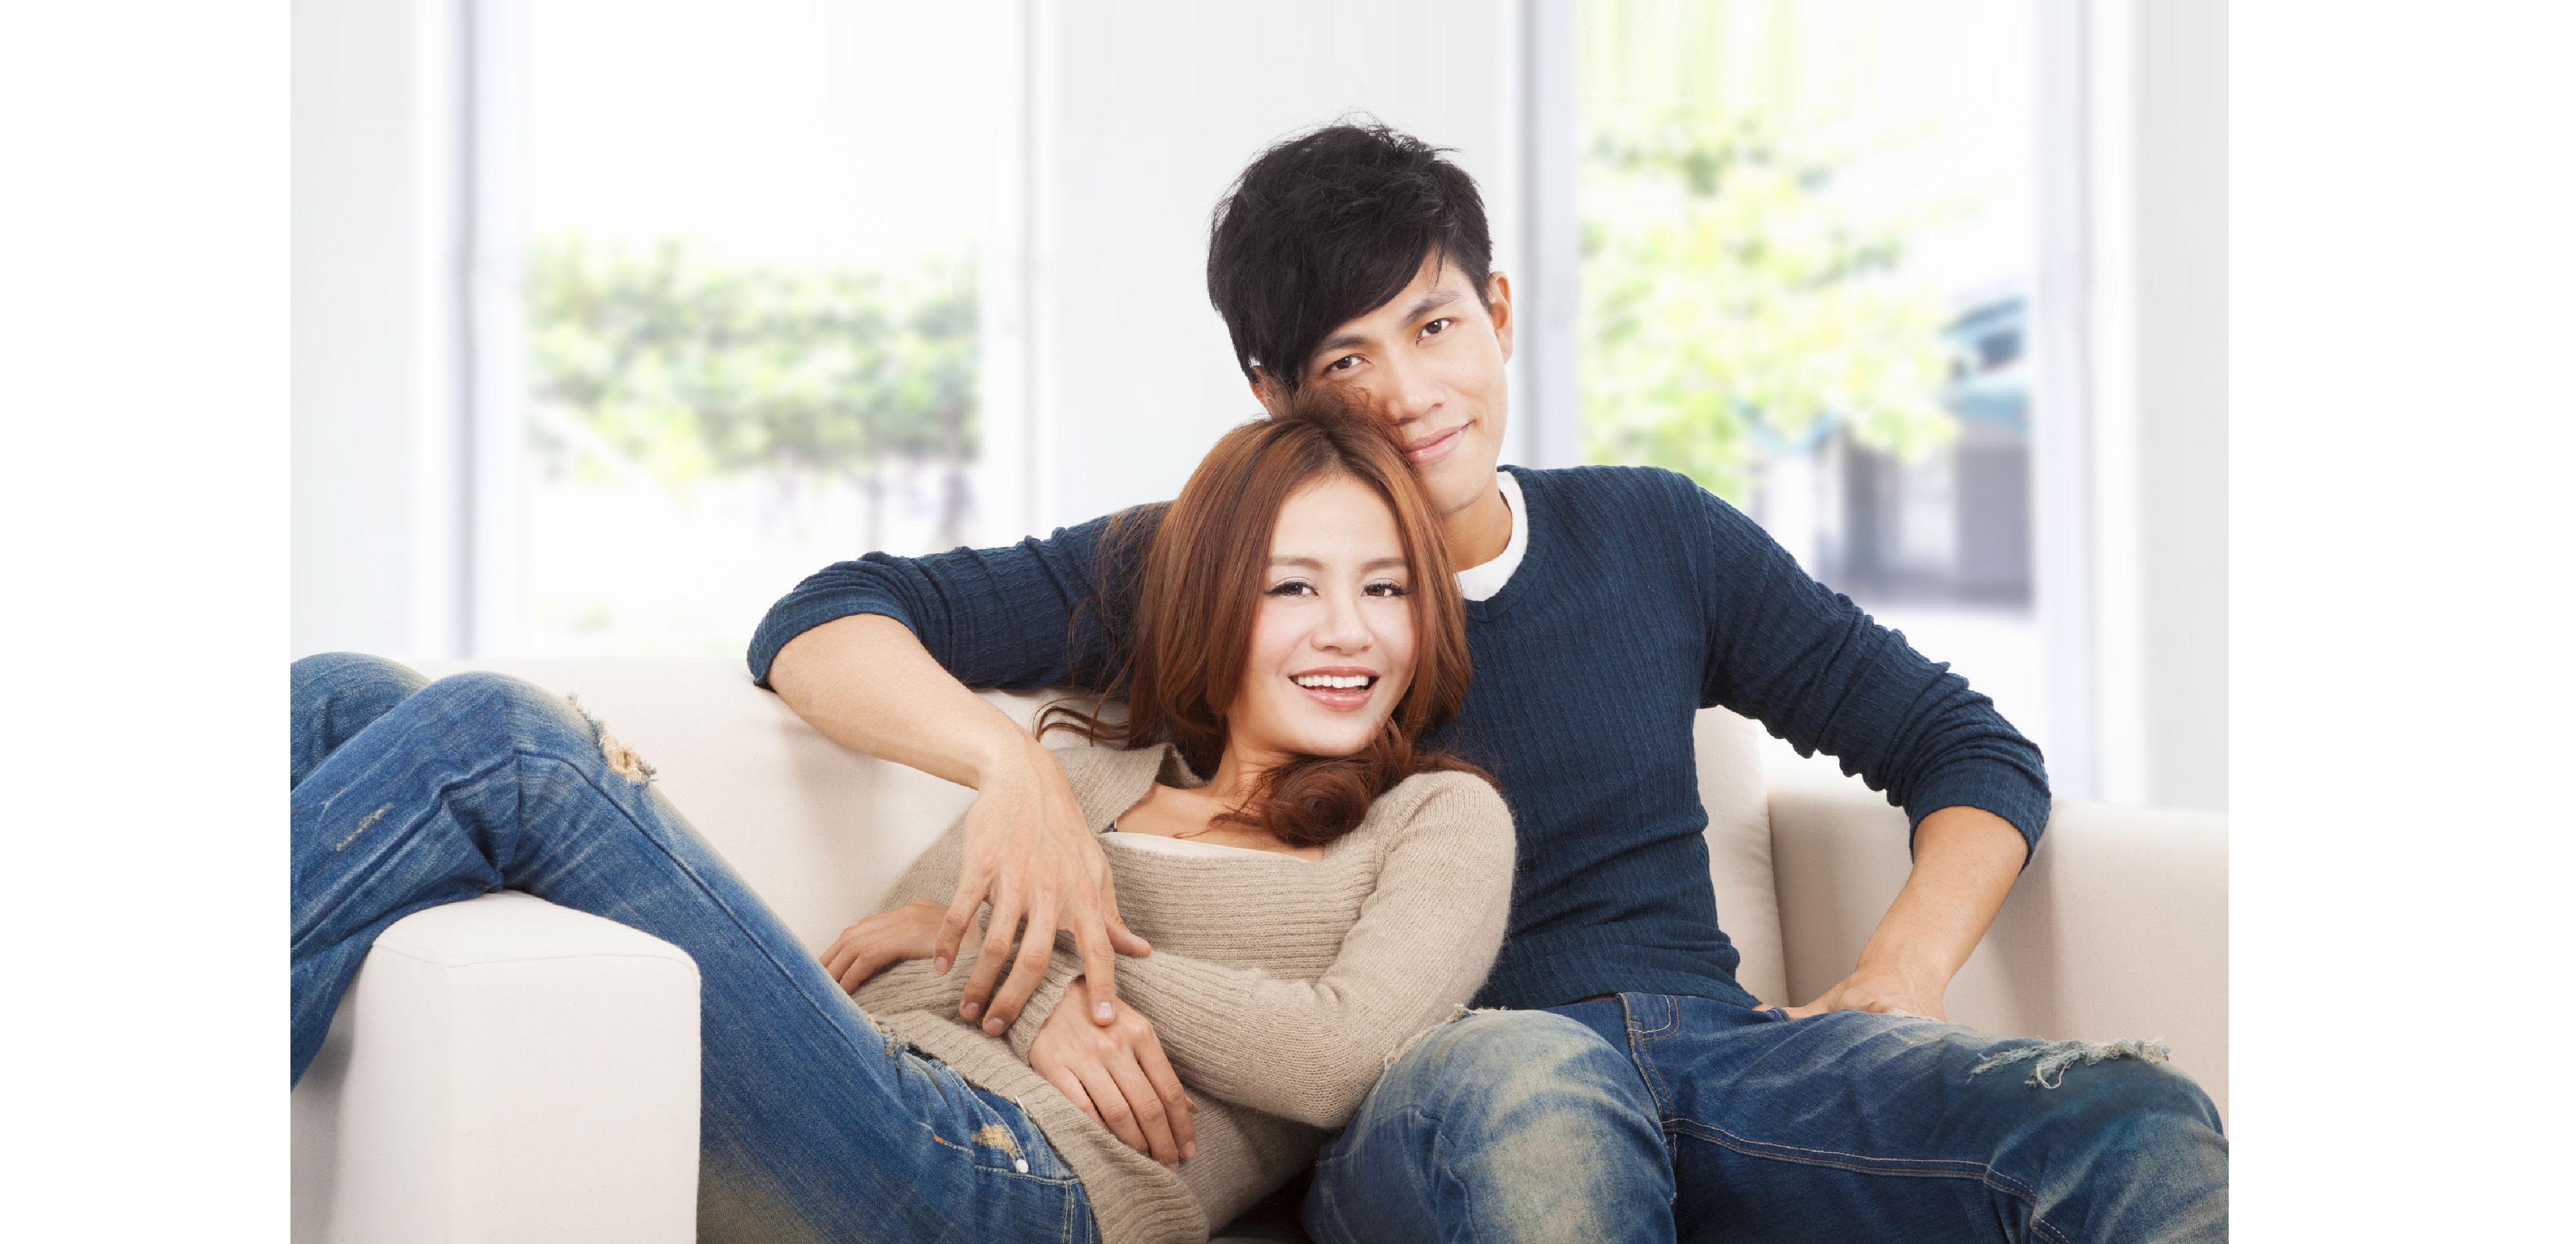 24232076_l couple together-01.jpg